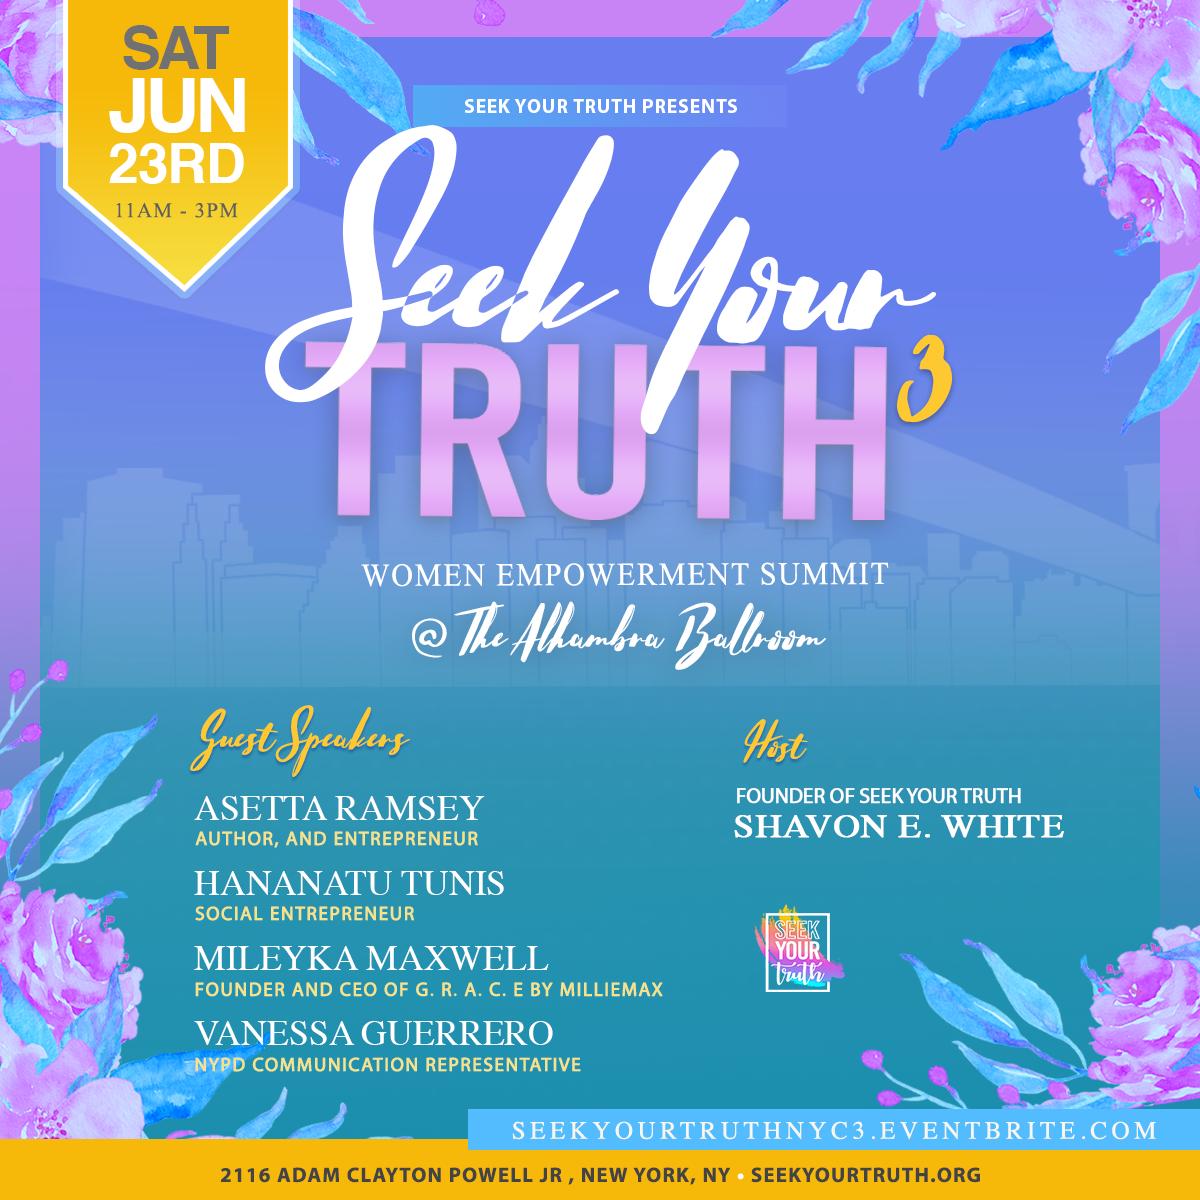 Seek Your Truth Women Empowerment Summit 2018